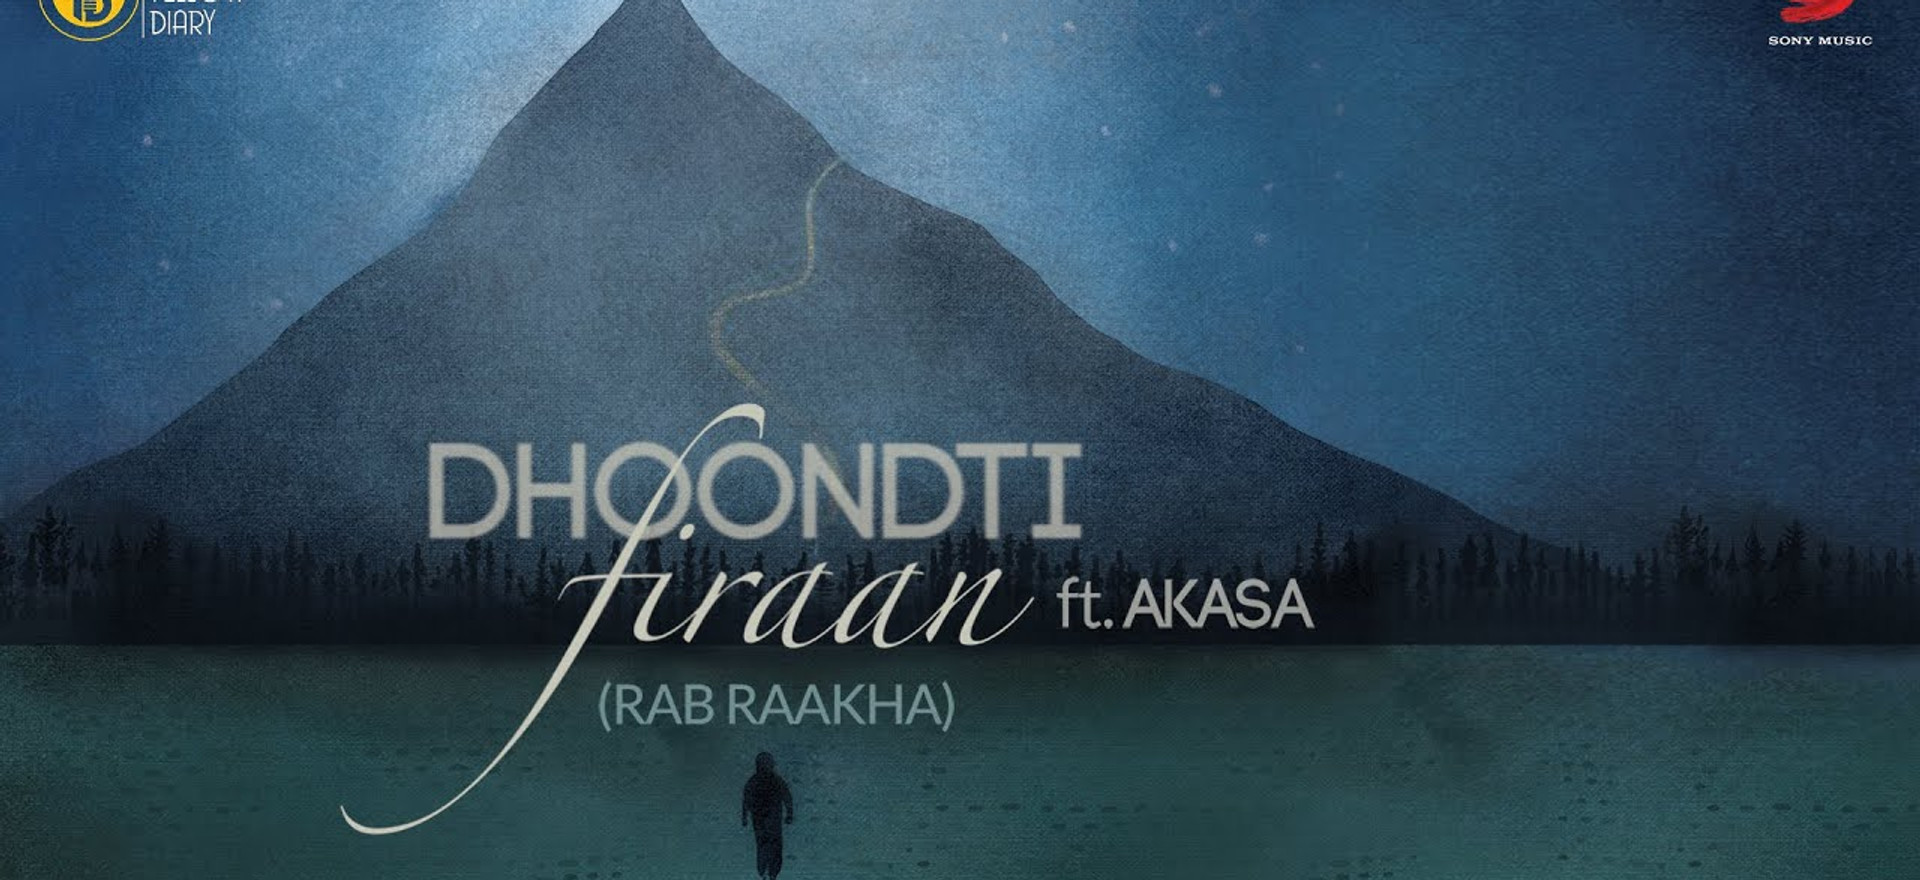 Dhoondti Firaan - Official Music Video   The Yellow Diary   Akasa   Rab Raakha